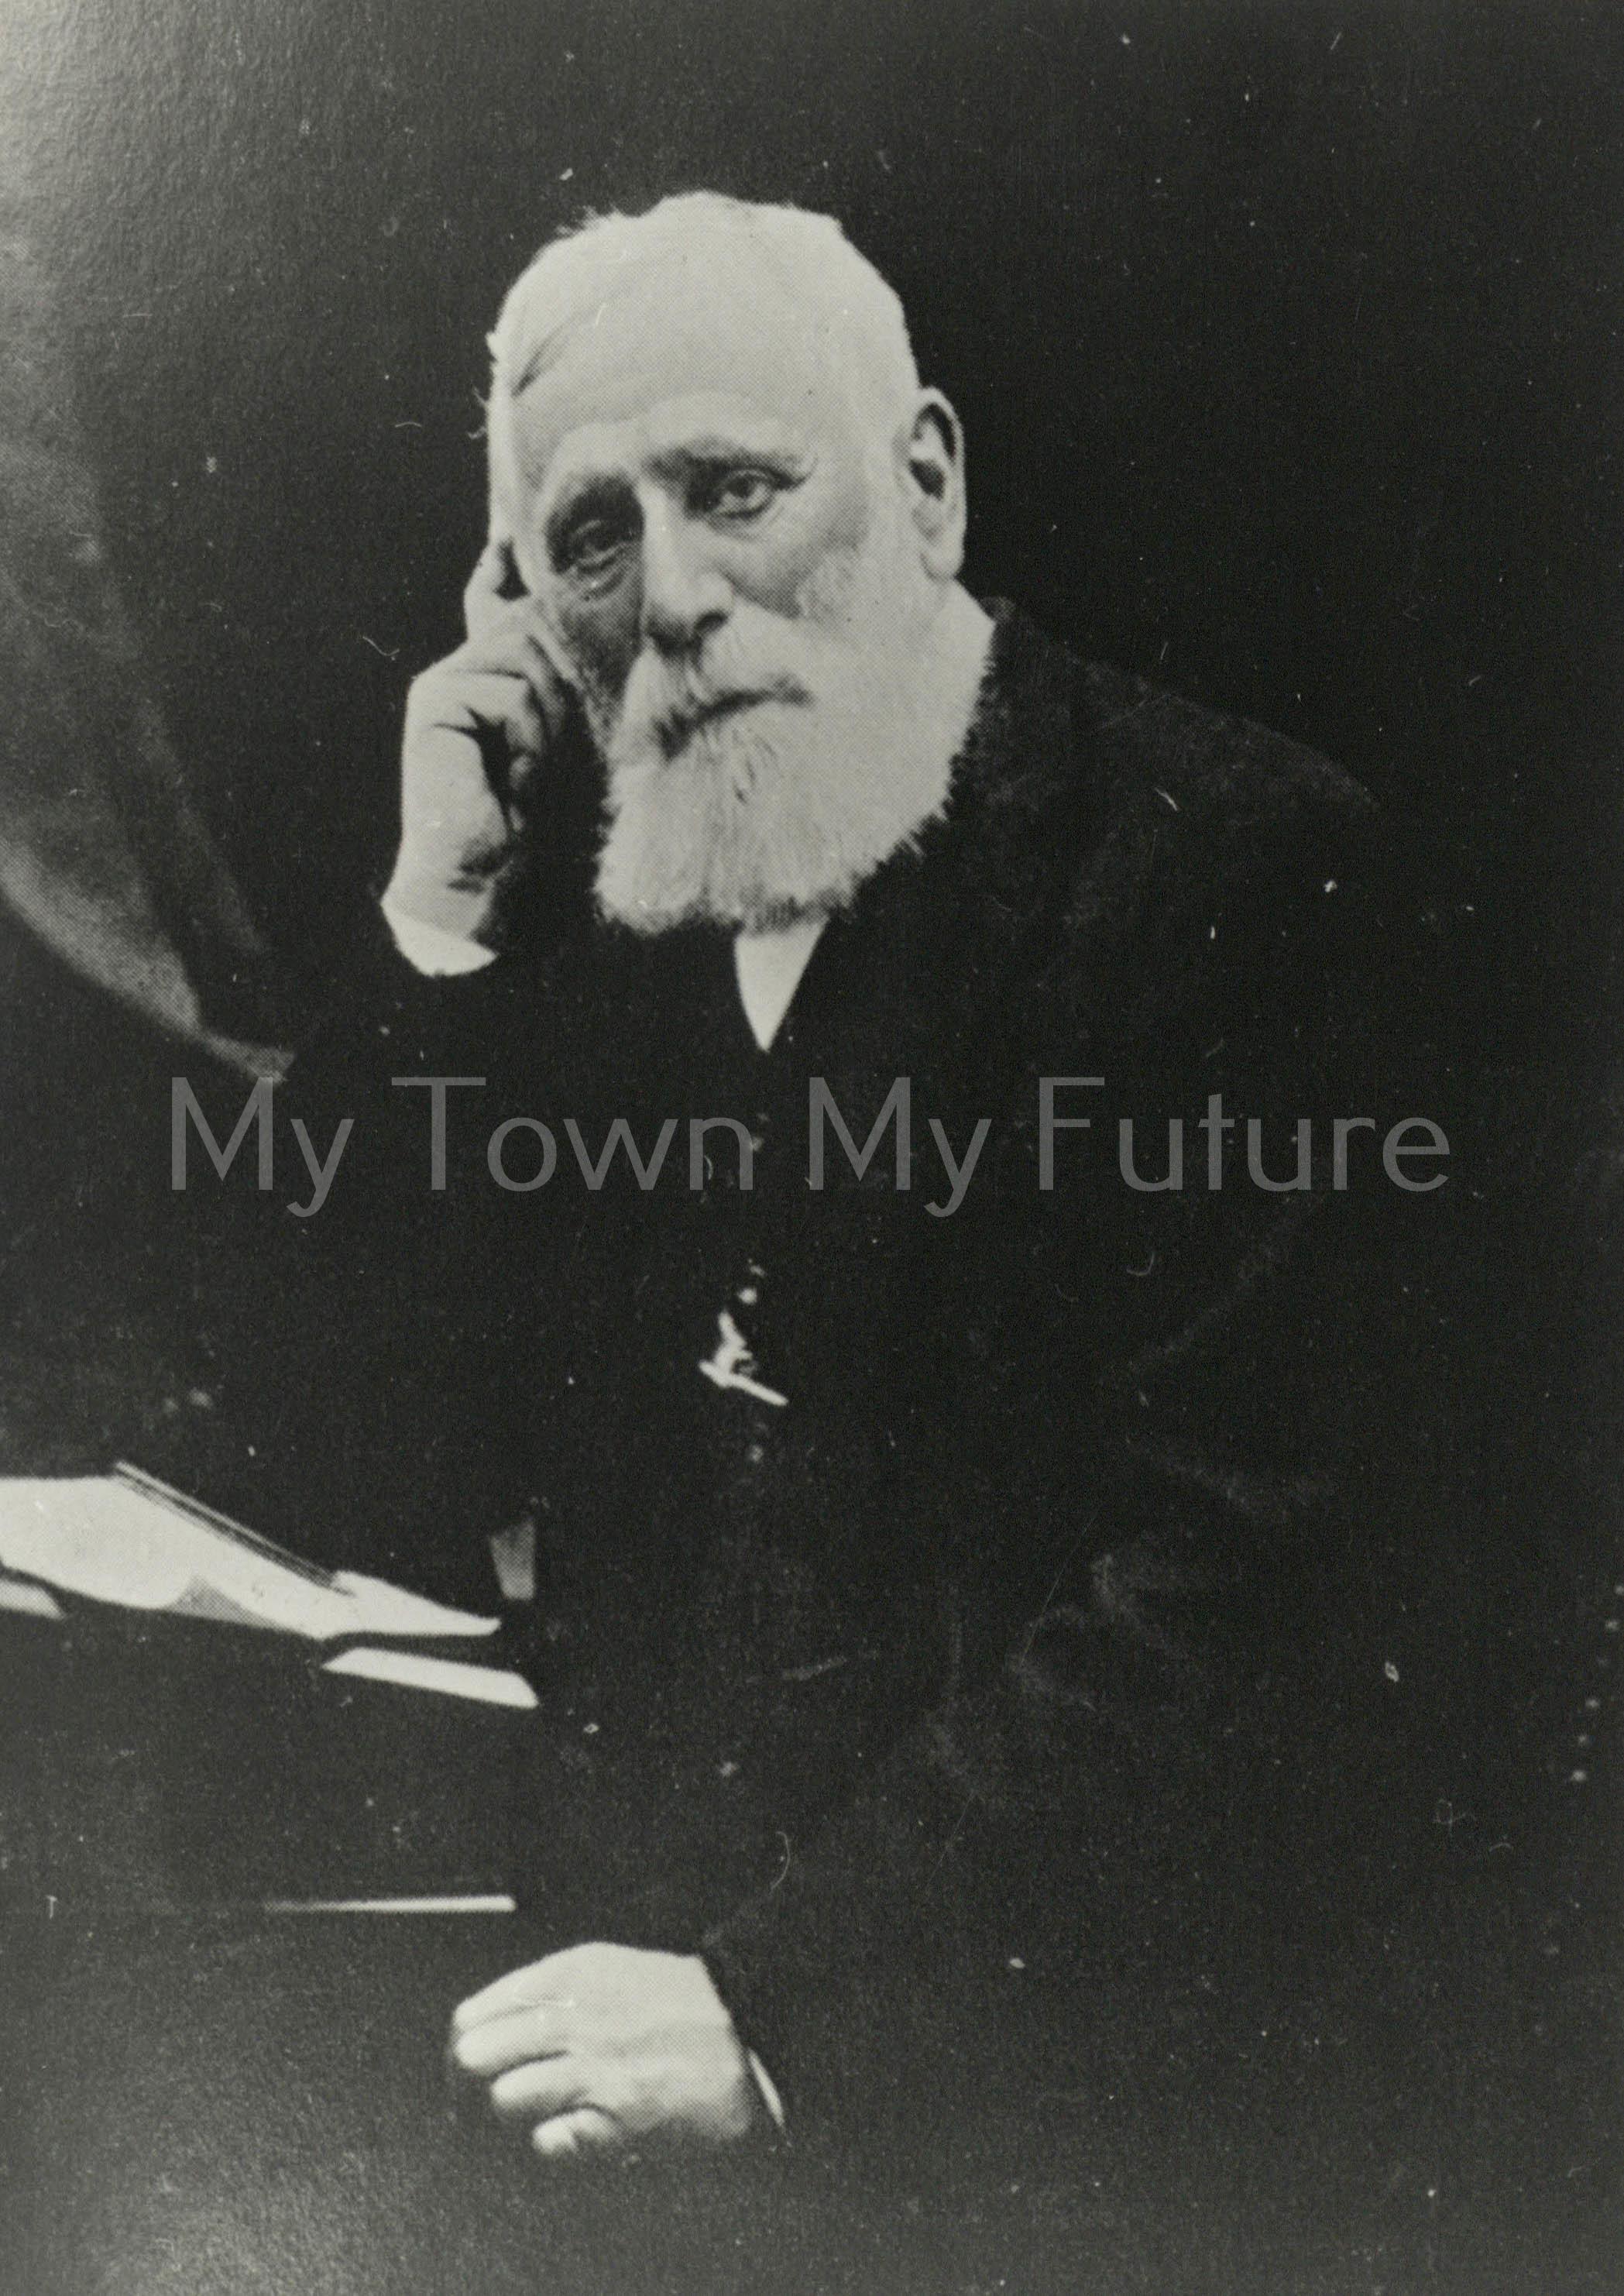 Sir Berhard Samuelson